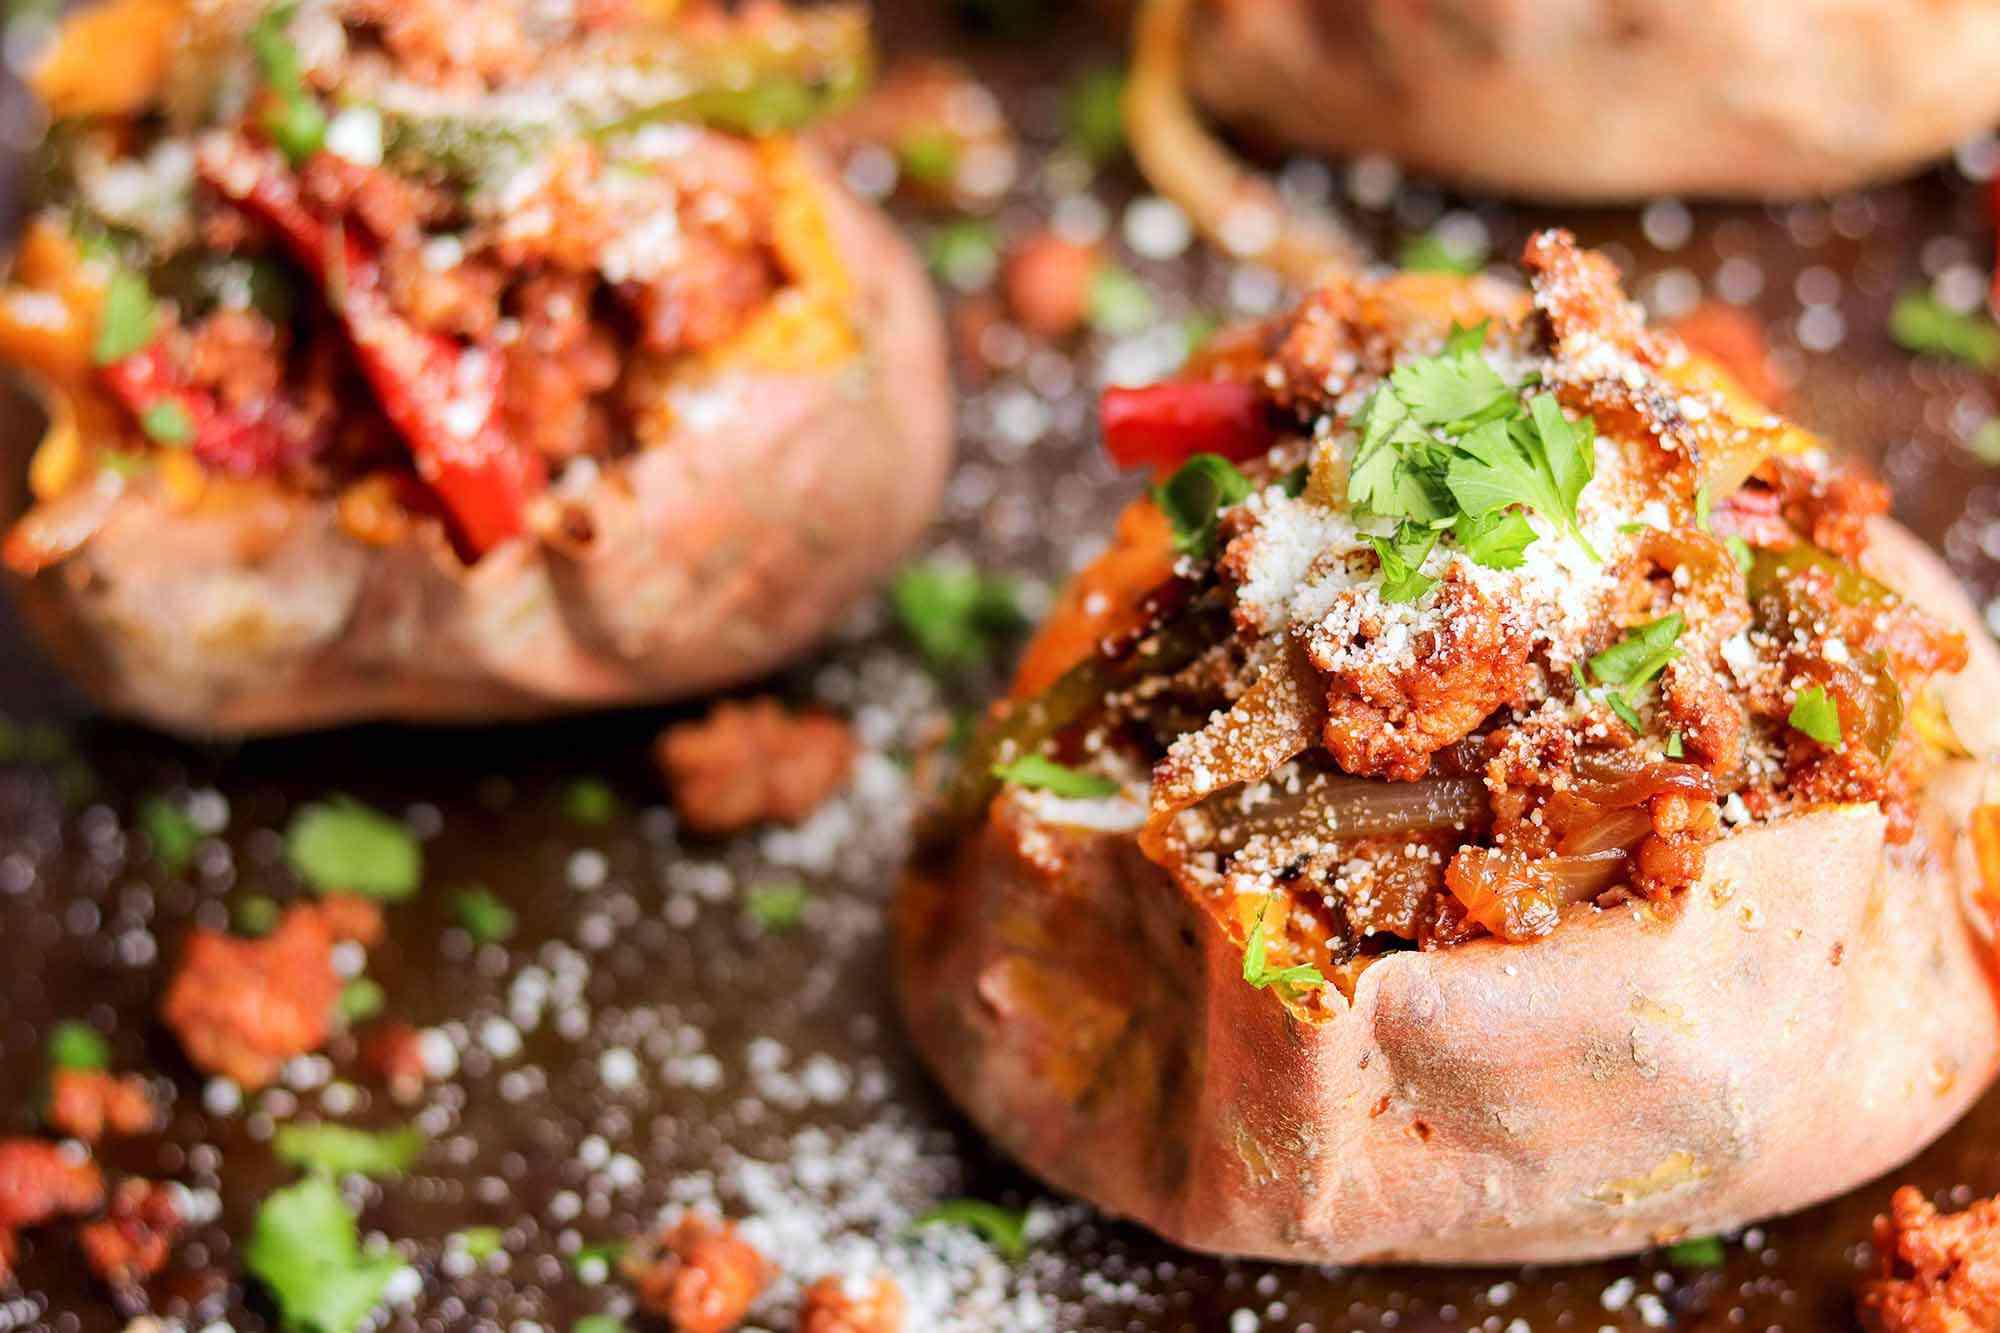 Roasted Sweet Potato Recipe stuff the potatoes